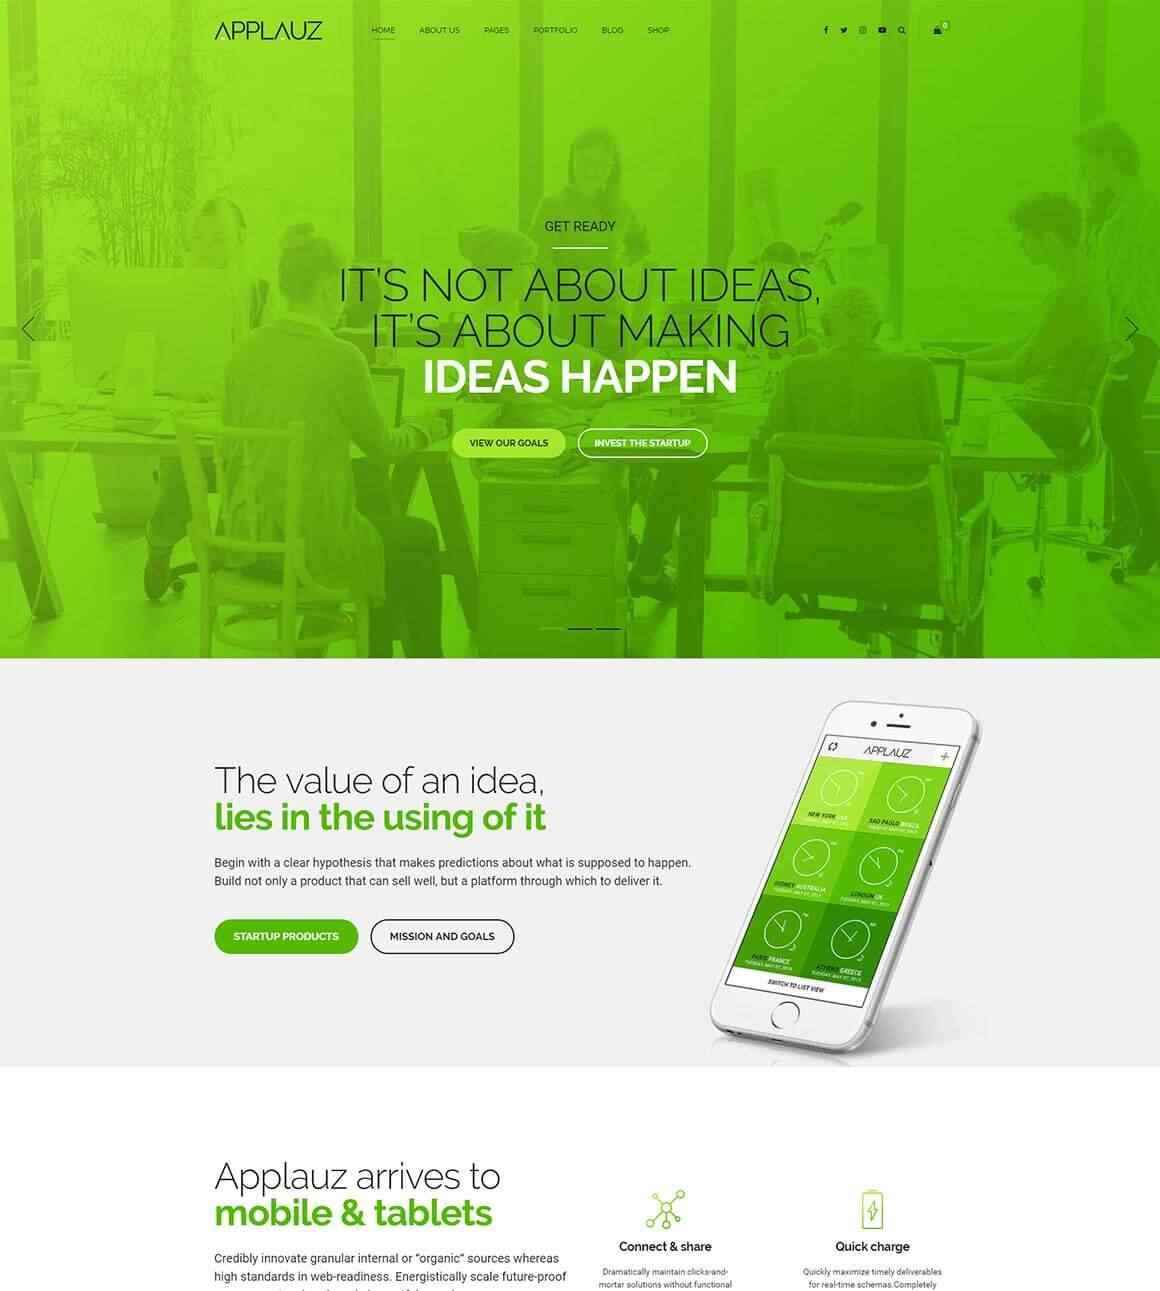 https://eagleservicehr.com/wp-content/uploads/2017/11/Screenshot-Startup.jpg